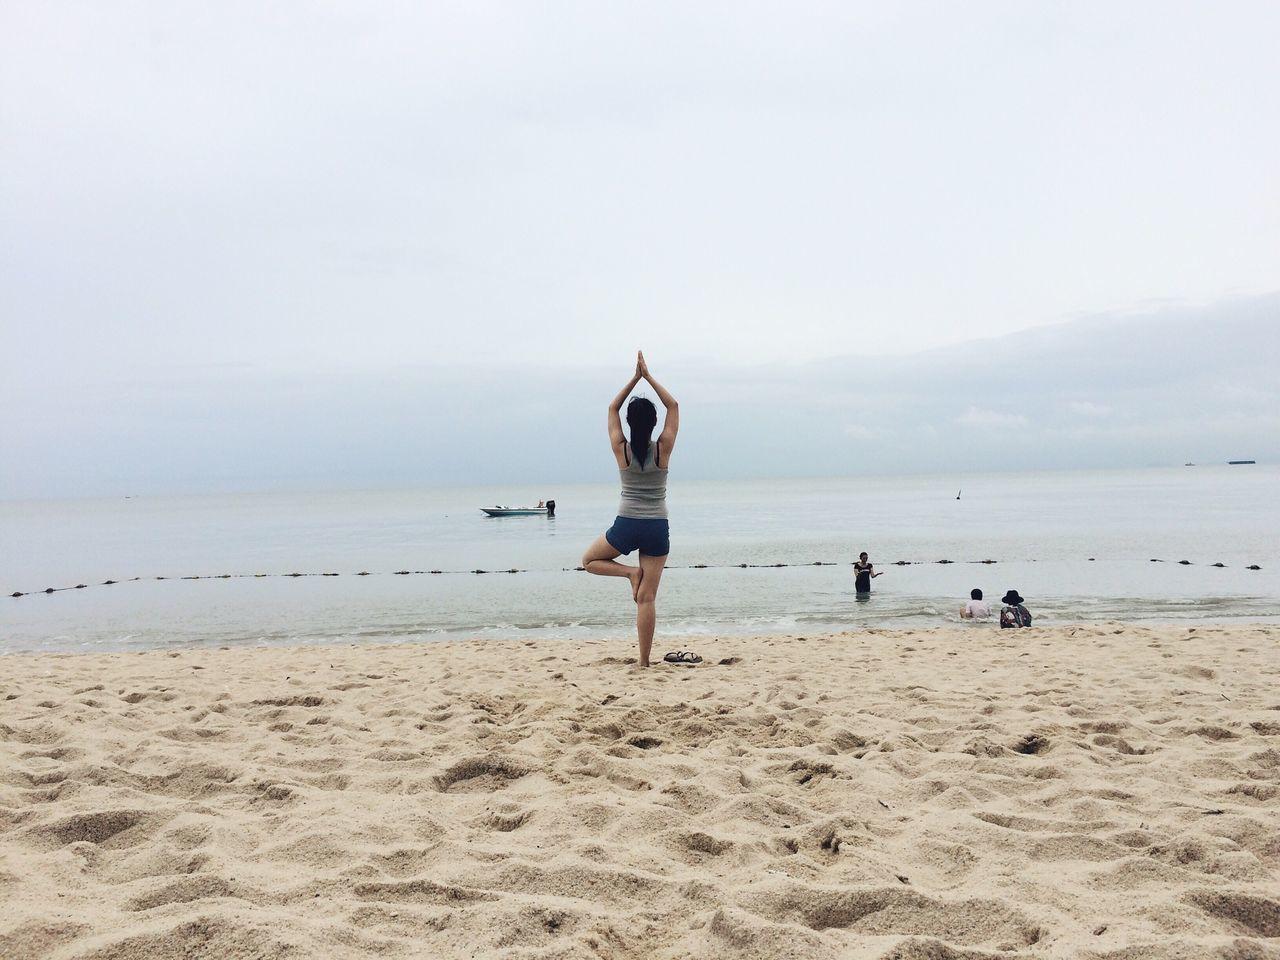 VSCO Taking Photos Photography Beach Learn & Shoot: Balancing Elements